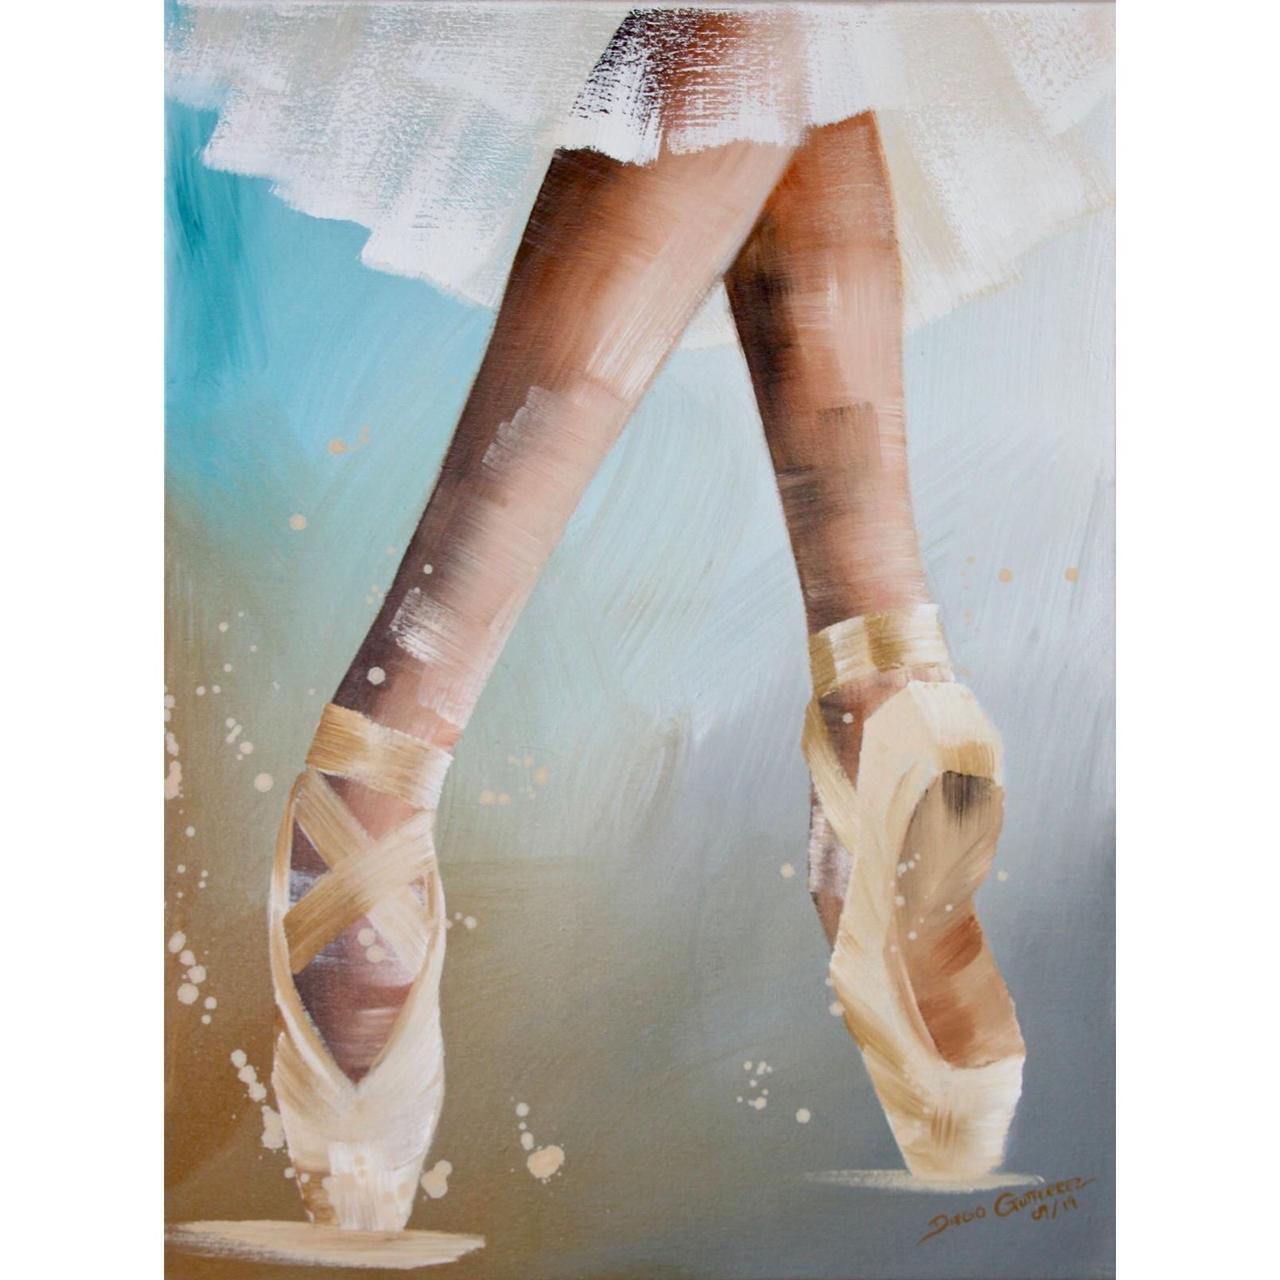 diego-gutierrez-gallery-ballerina-03-legs